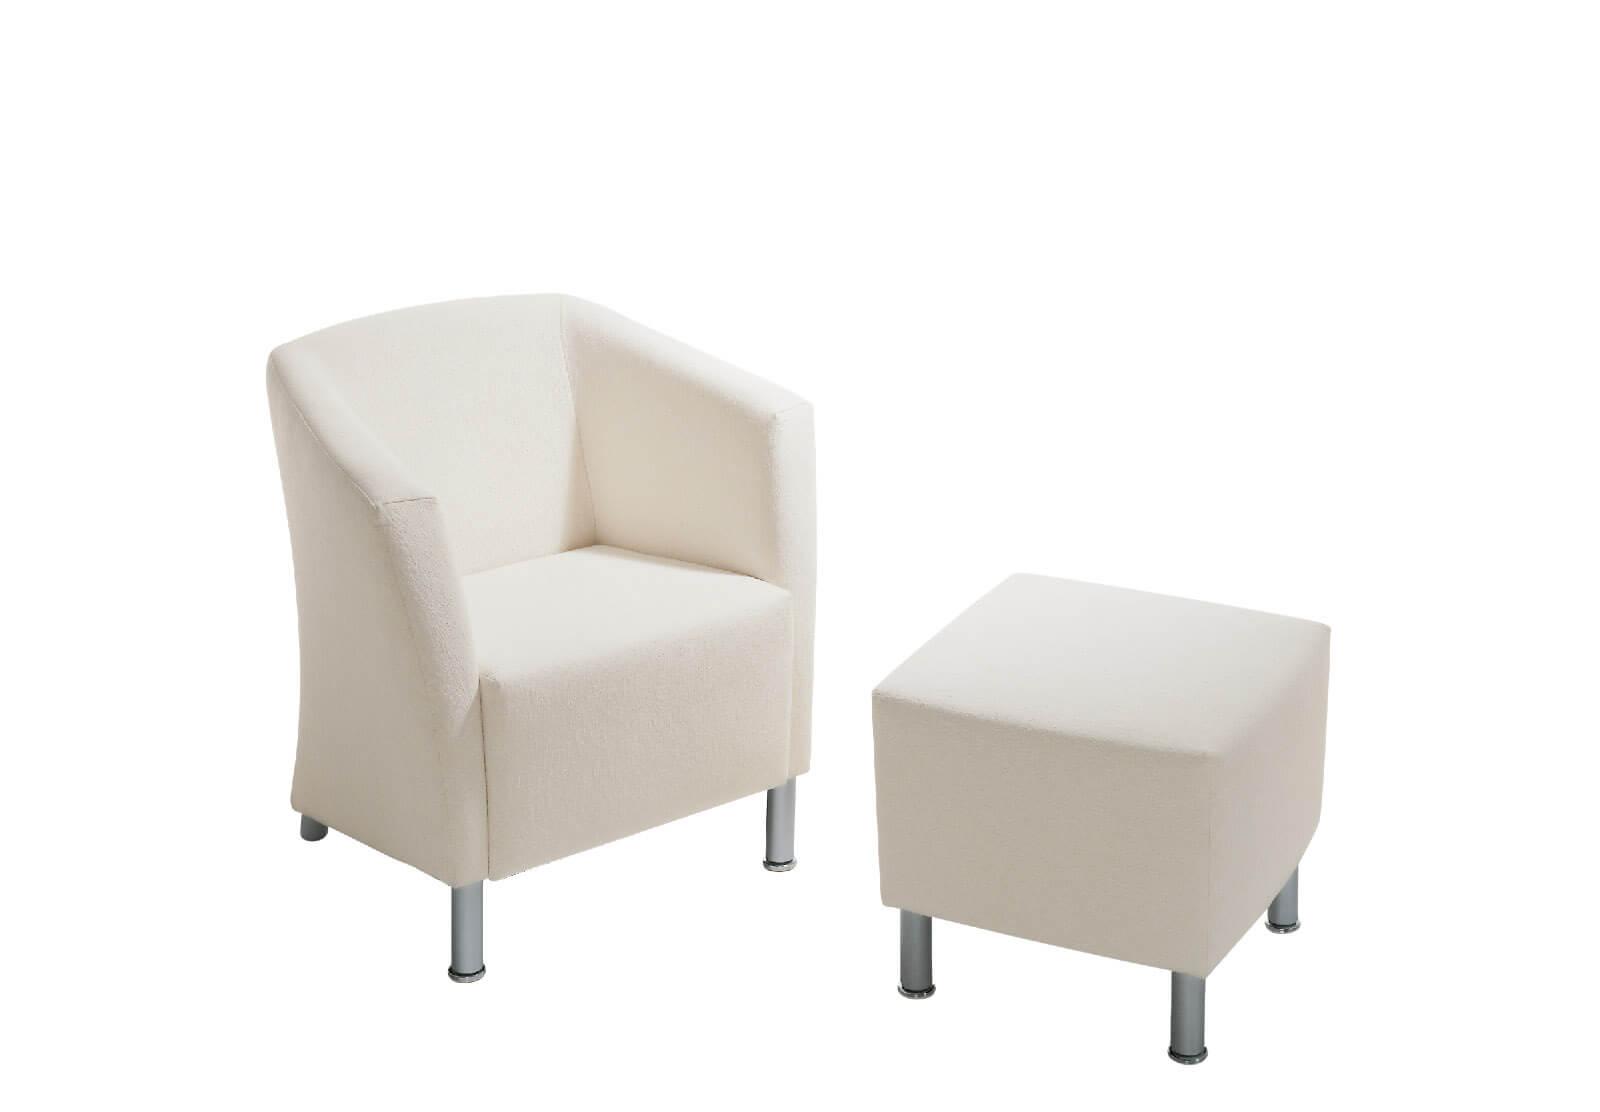 relaxsessel bingo von franz fertig. Black Bedroom Furniture Sets. Home Design Ideas